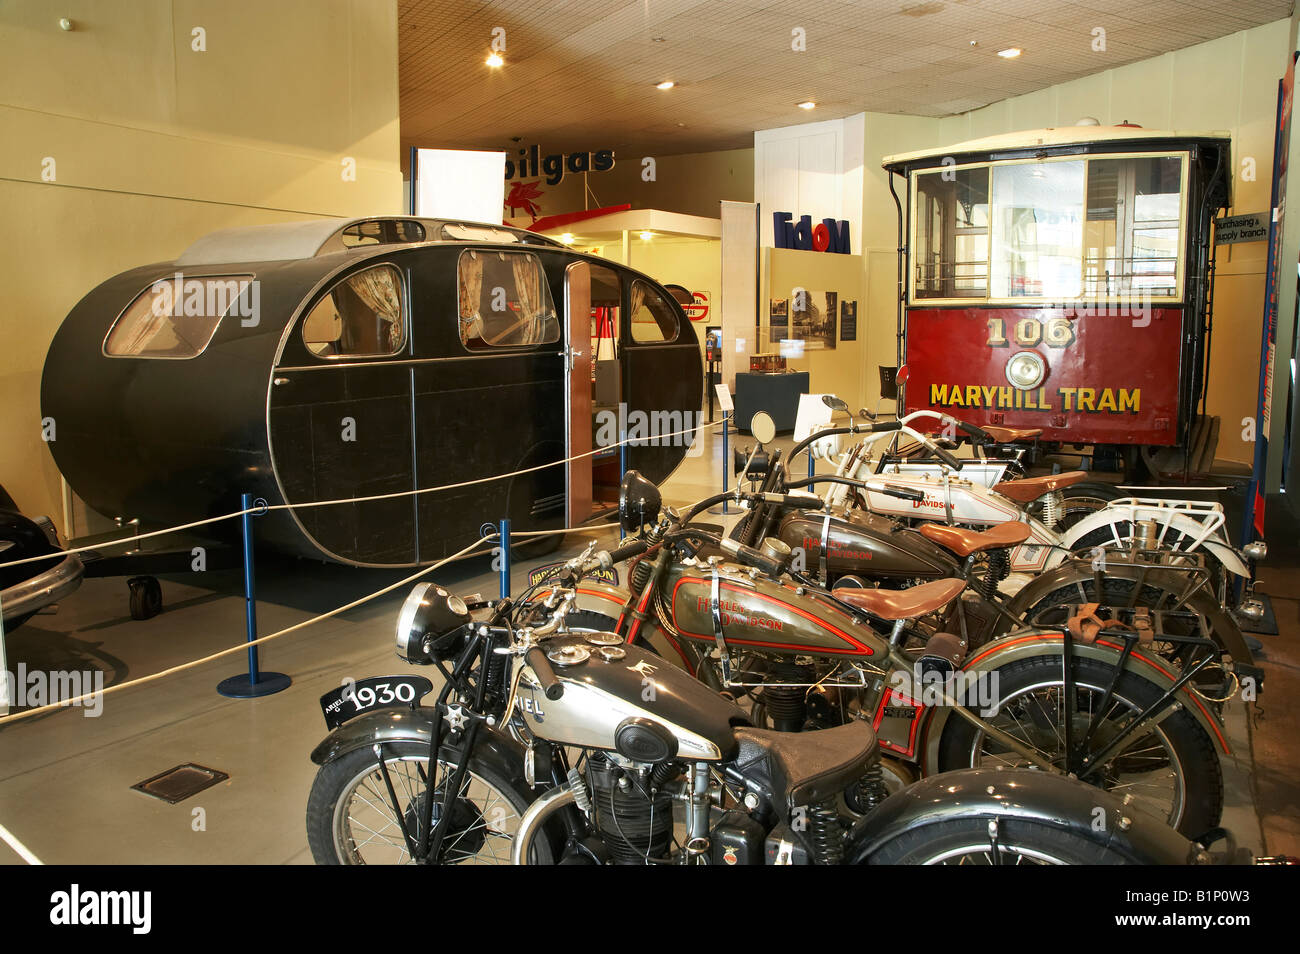 Vintage Motorcycles Caravan and Tram Otago Settlers Museum Dunedin South Island New Zealand - Stock Image